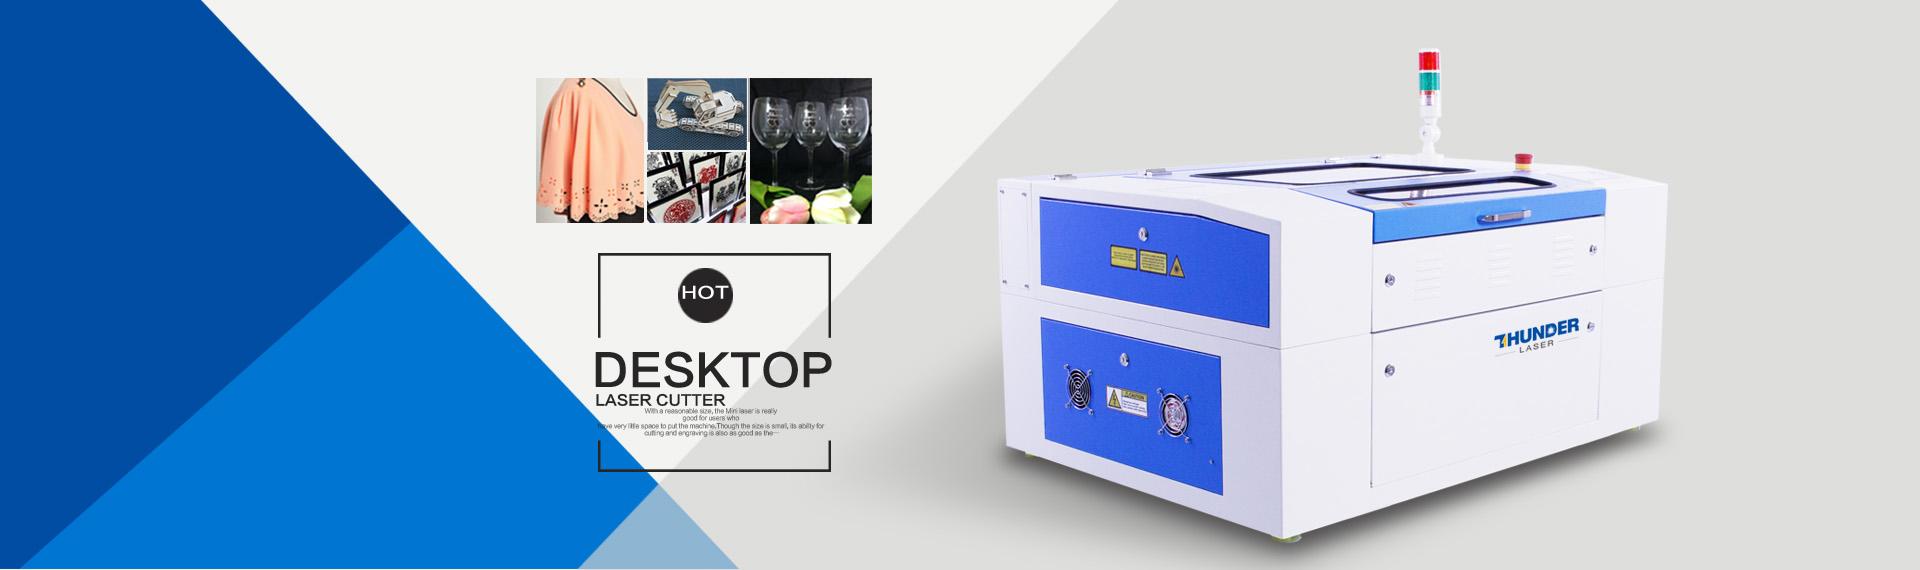 Desktop Nova 24 laser cutting machine